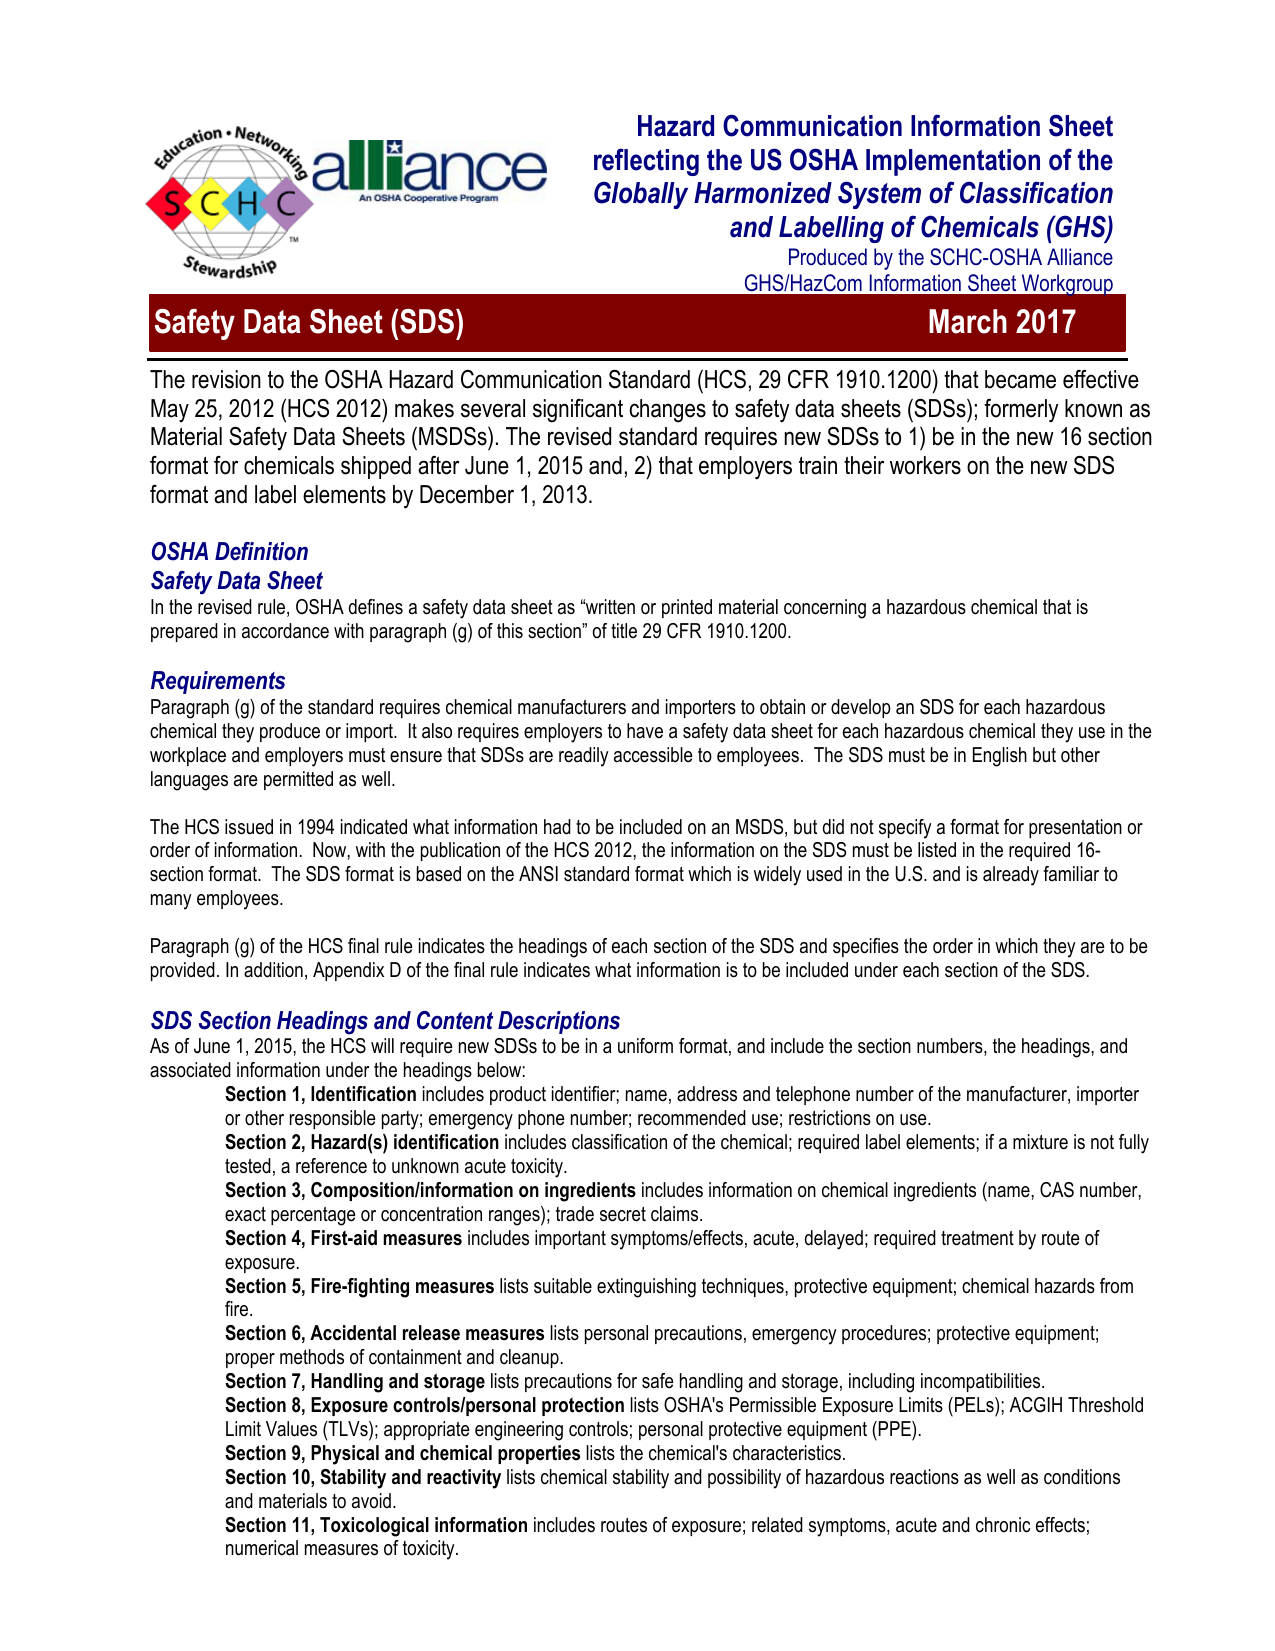 Safety Data Sheet - Society for Chemical Hazard Communication